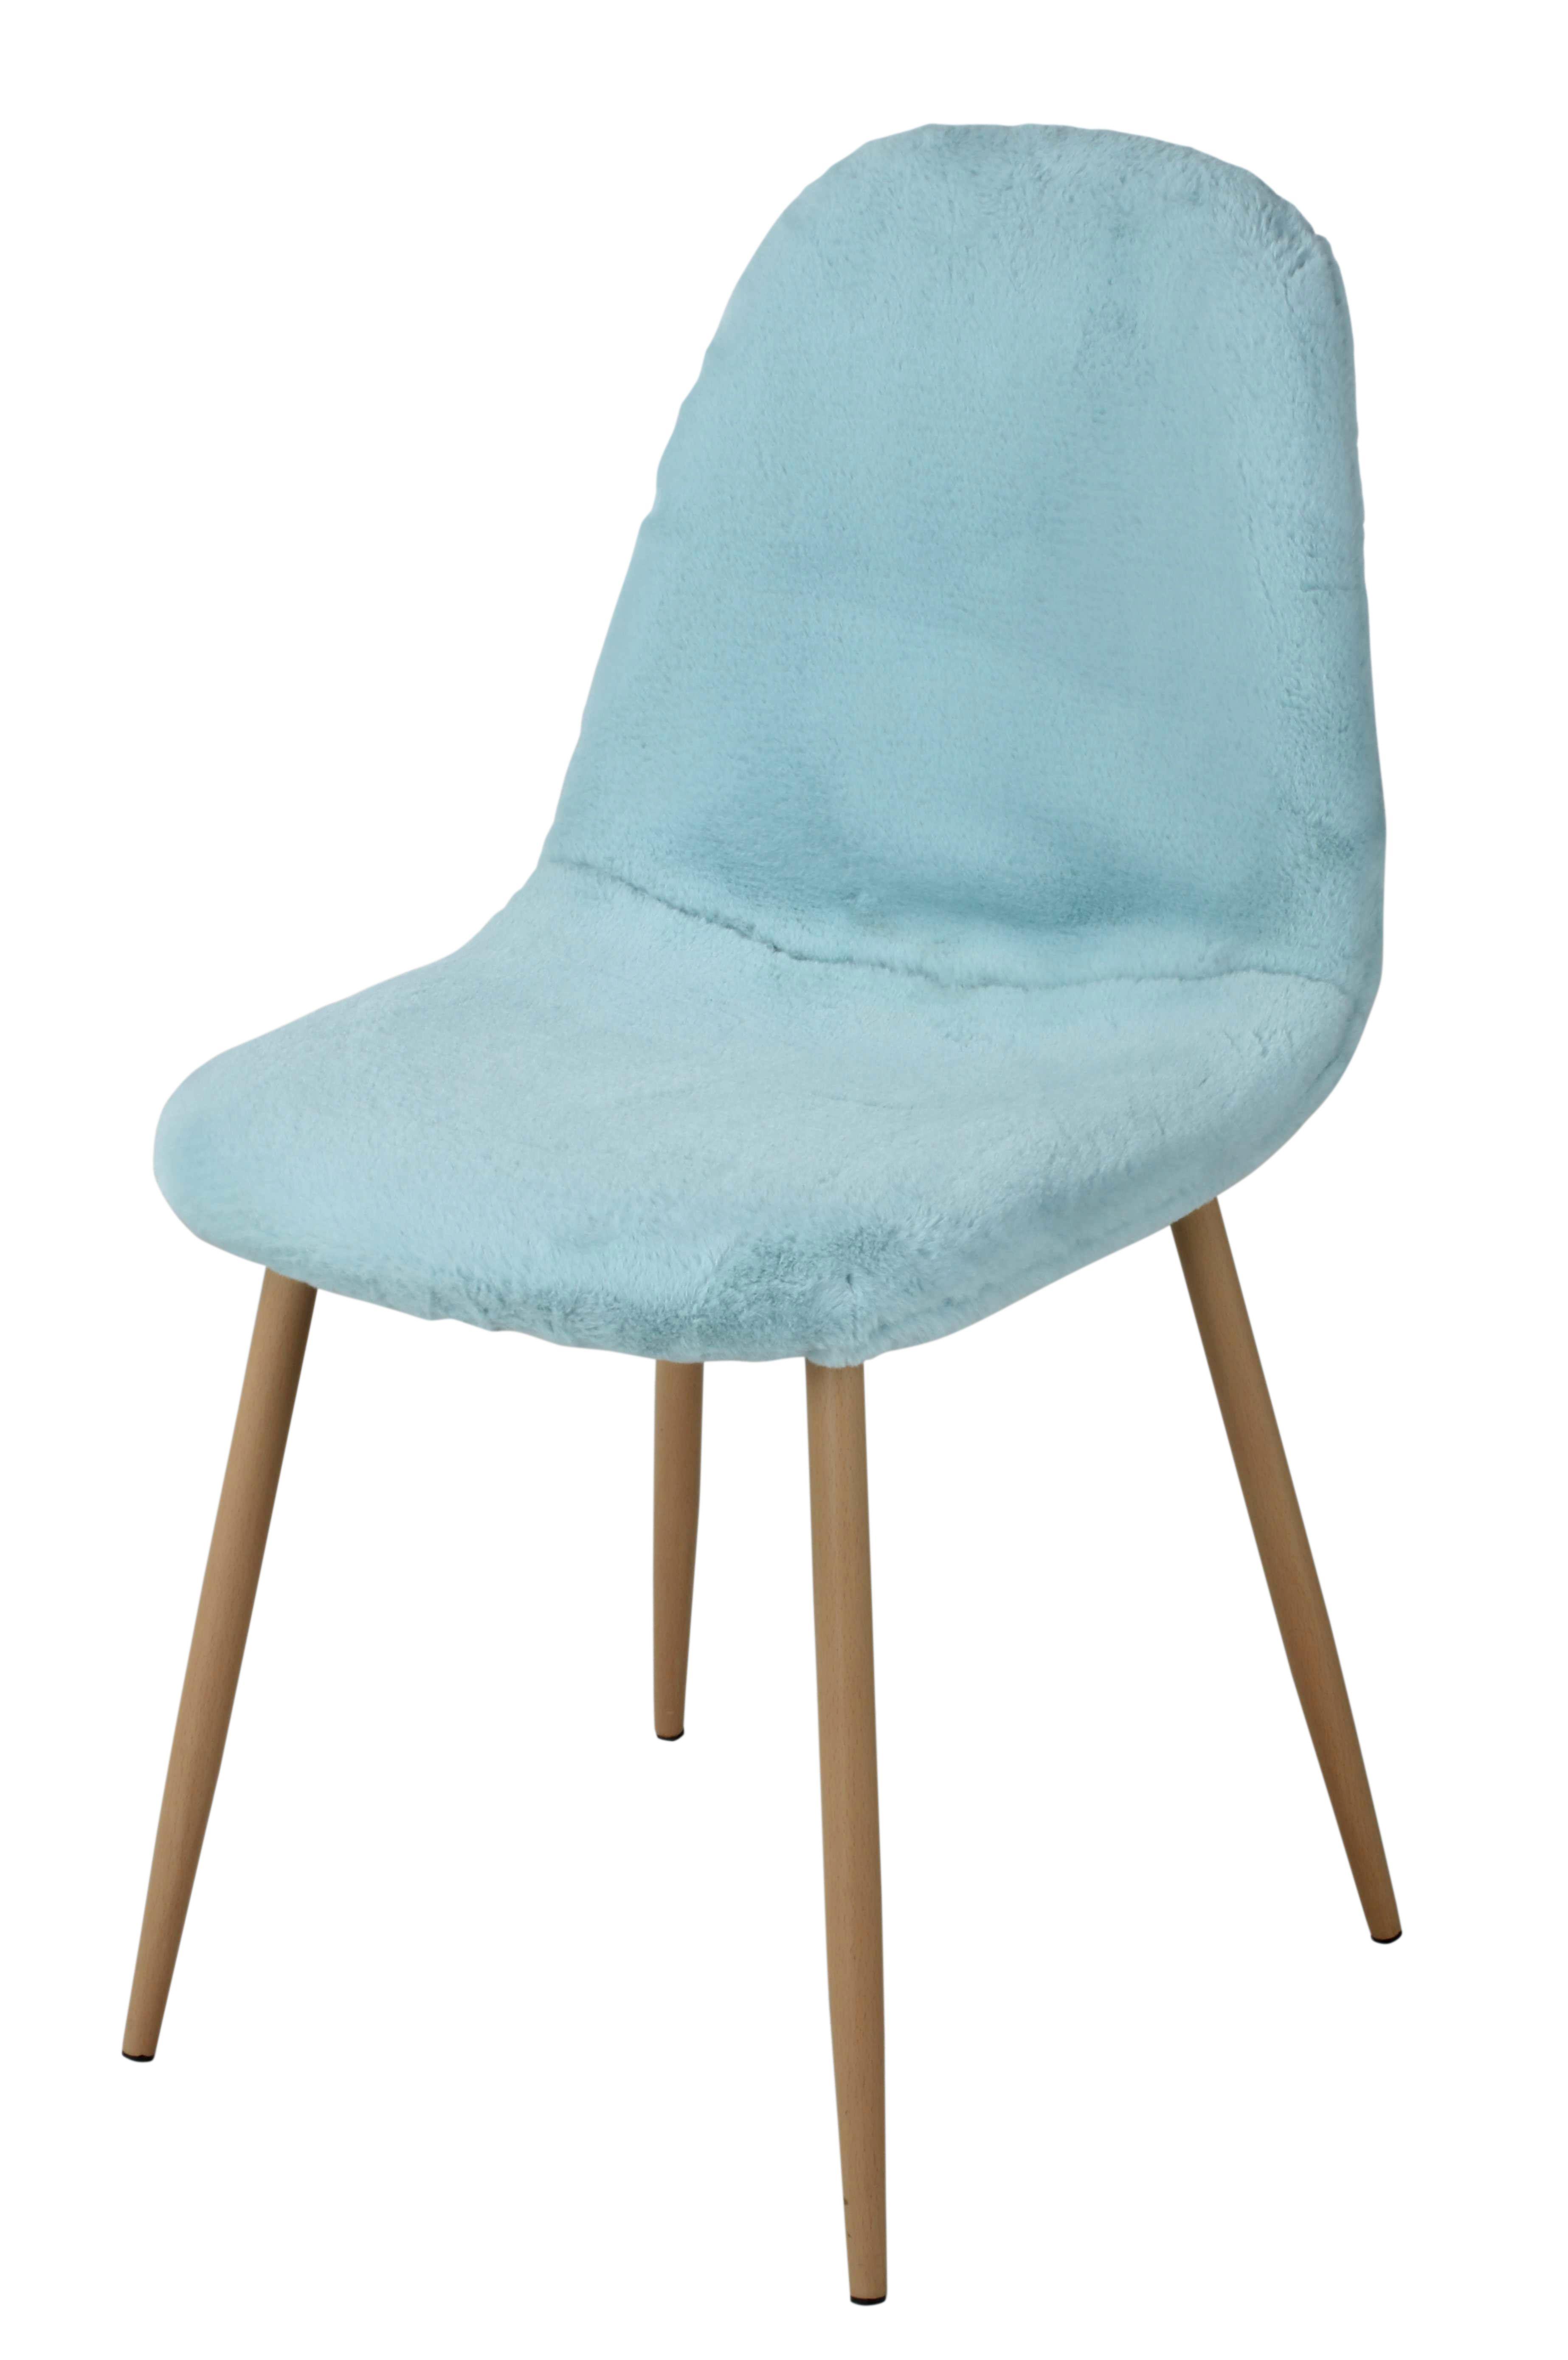 chaise paysanne rouge affordable pouf table de nuit someo marron vintage with chaise paysanne. Black Bedroom Furniture Sets. Home Design Ideas